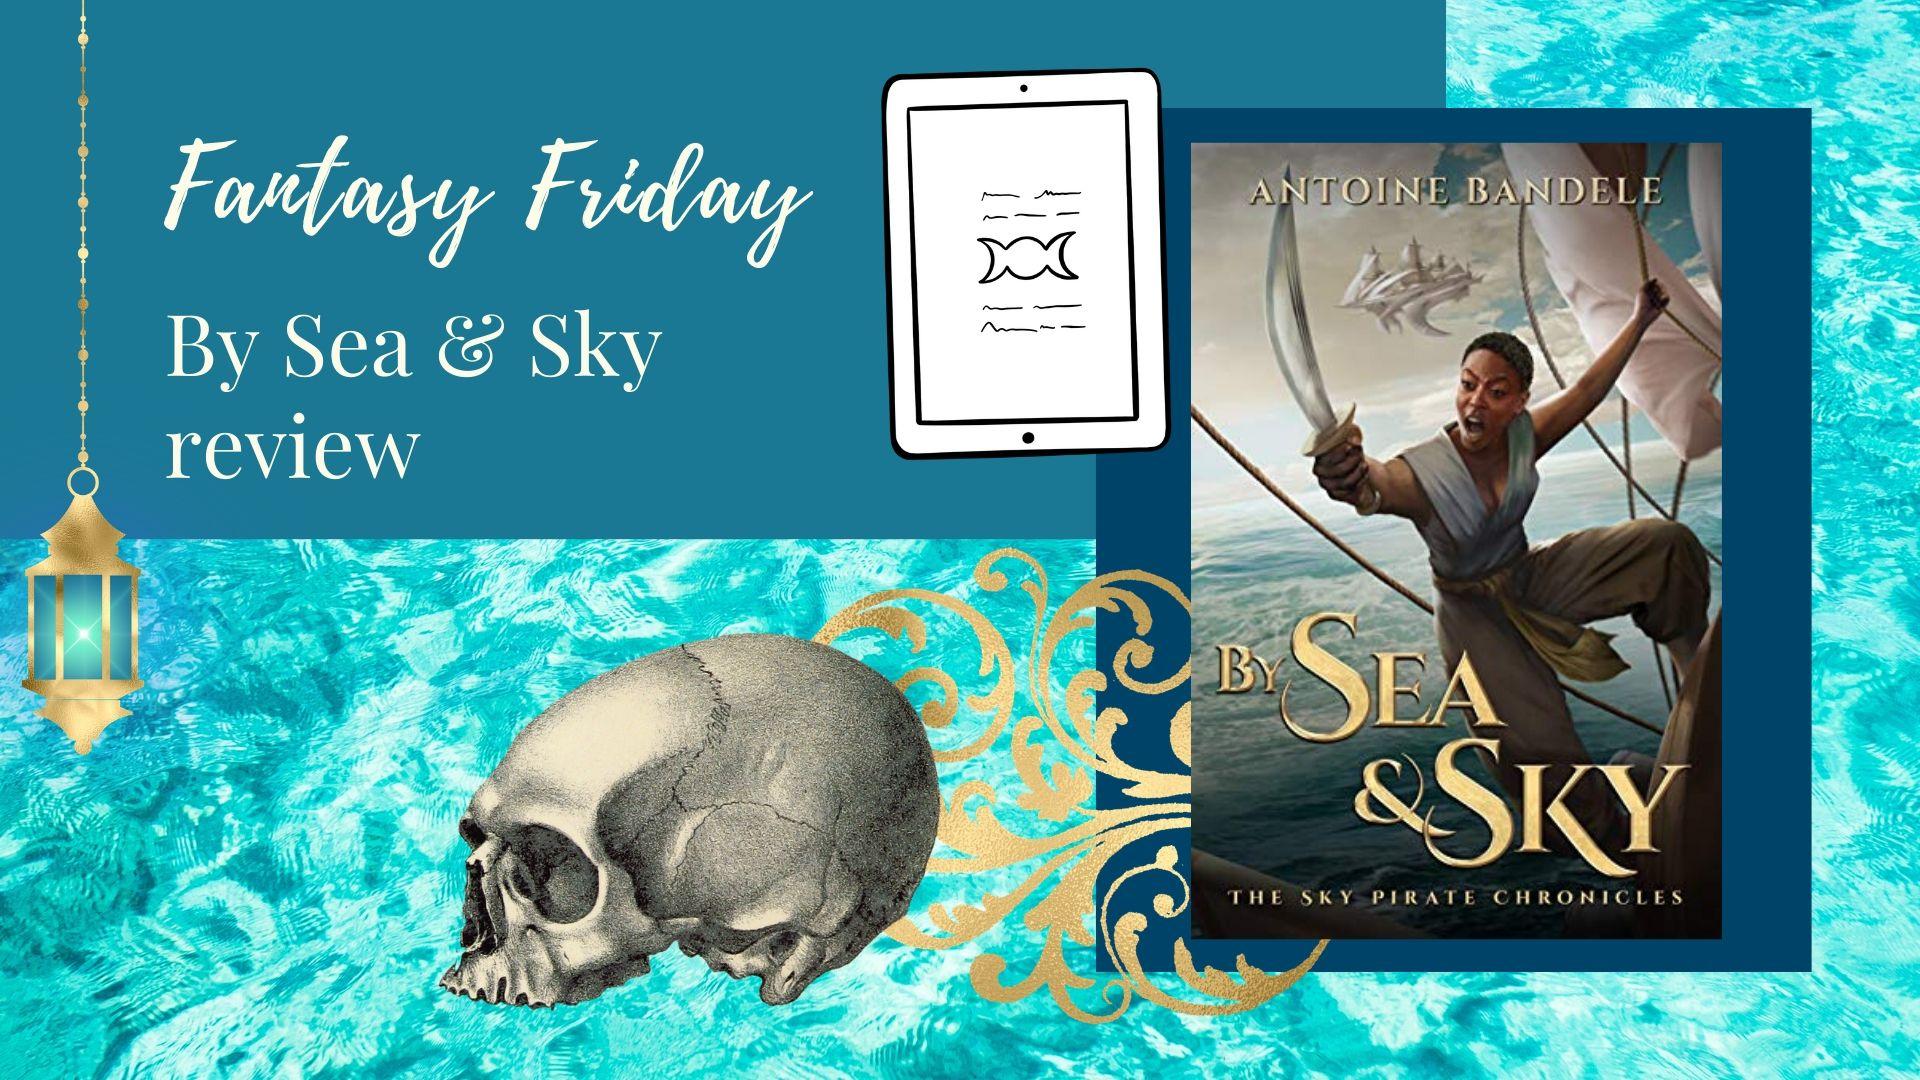 Fantasy Friday: By Sea & Sky by Antoine Bandele